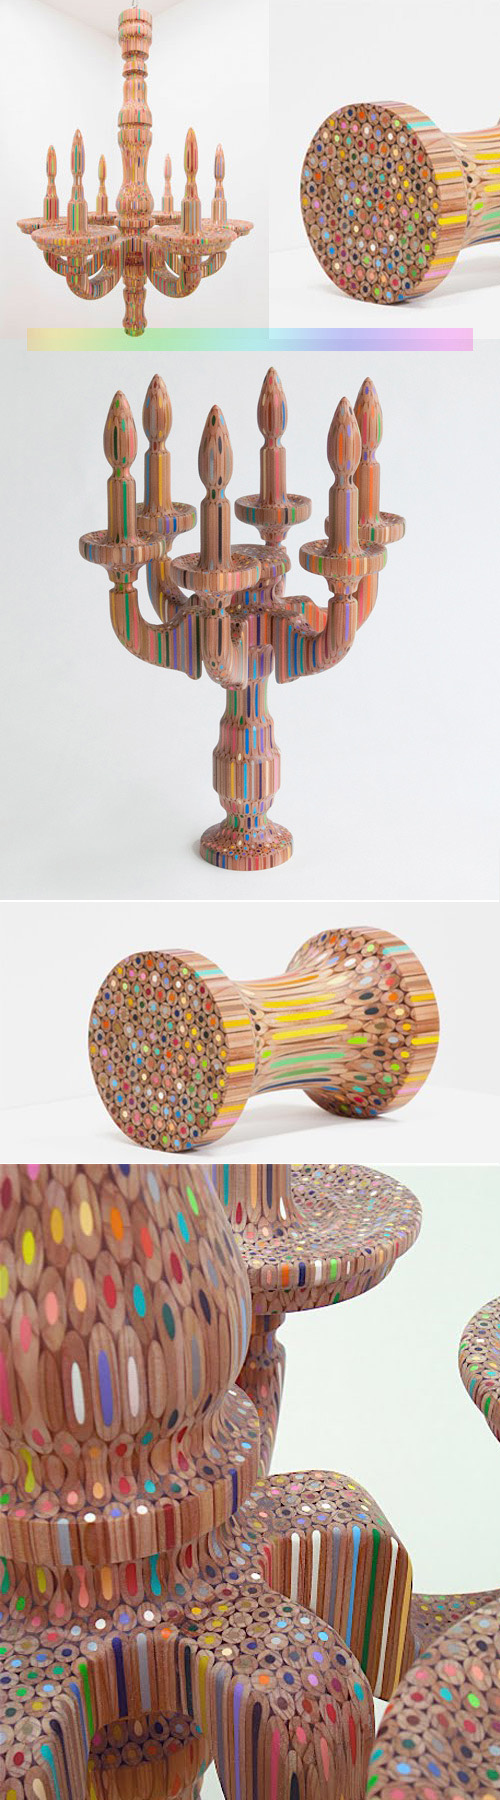 takafumi-yagi-colored-pencil-sculptures-1.jpg